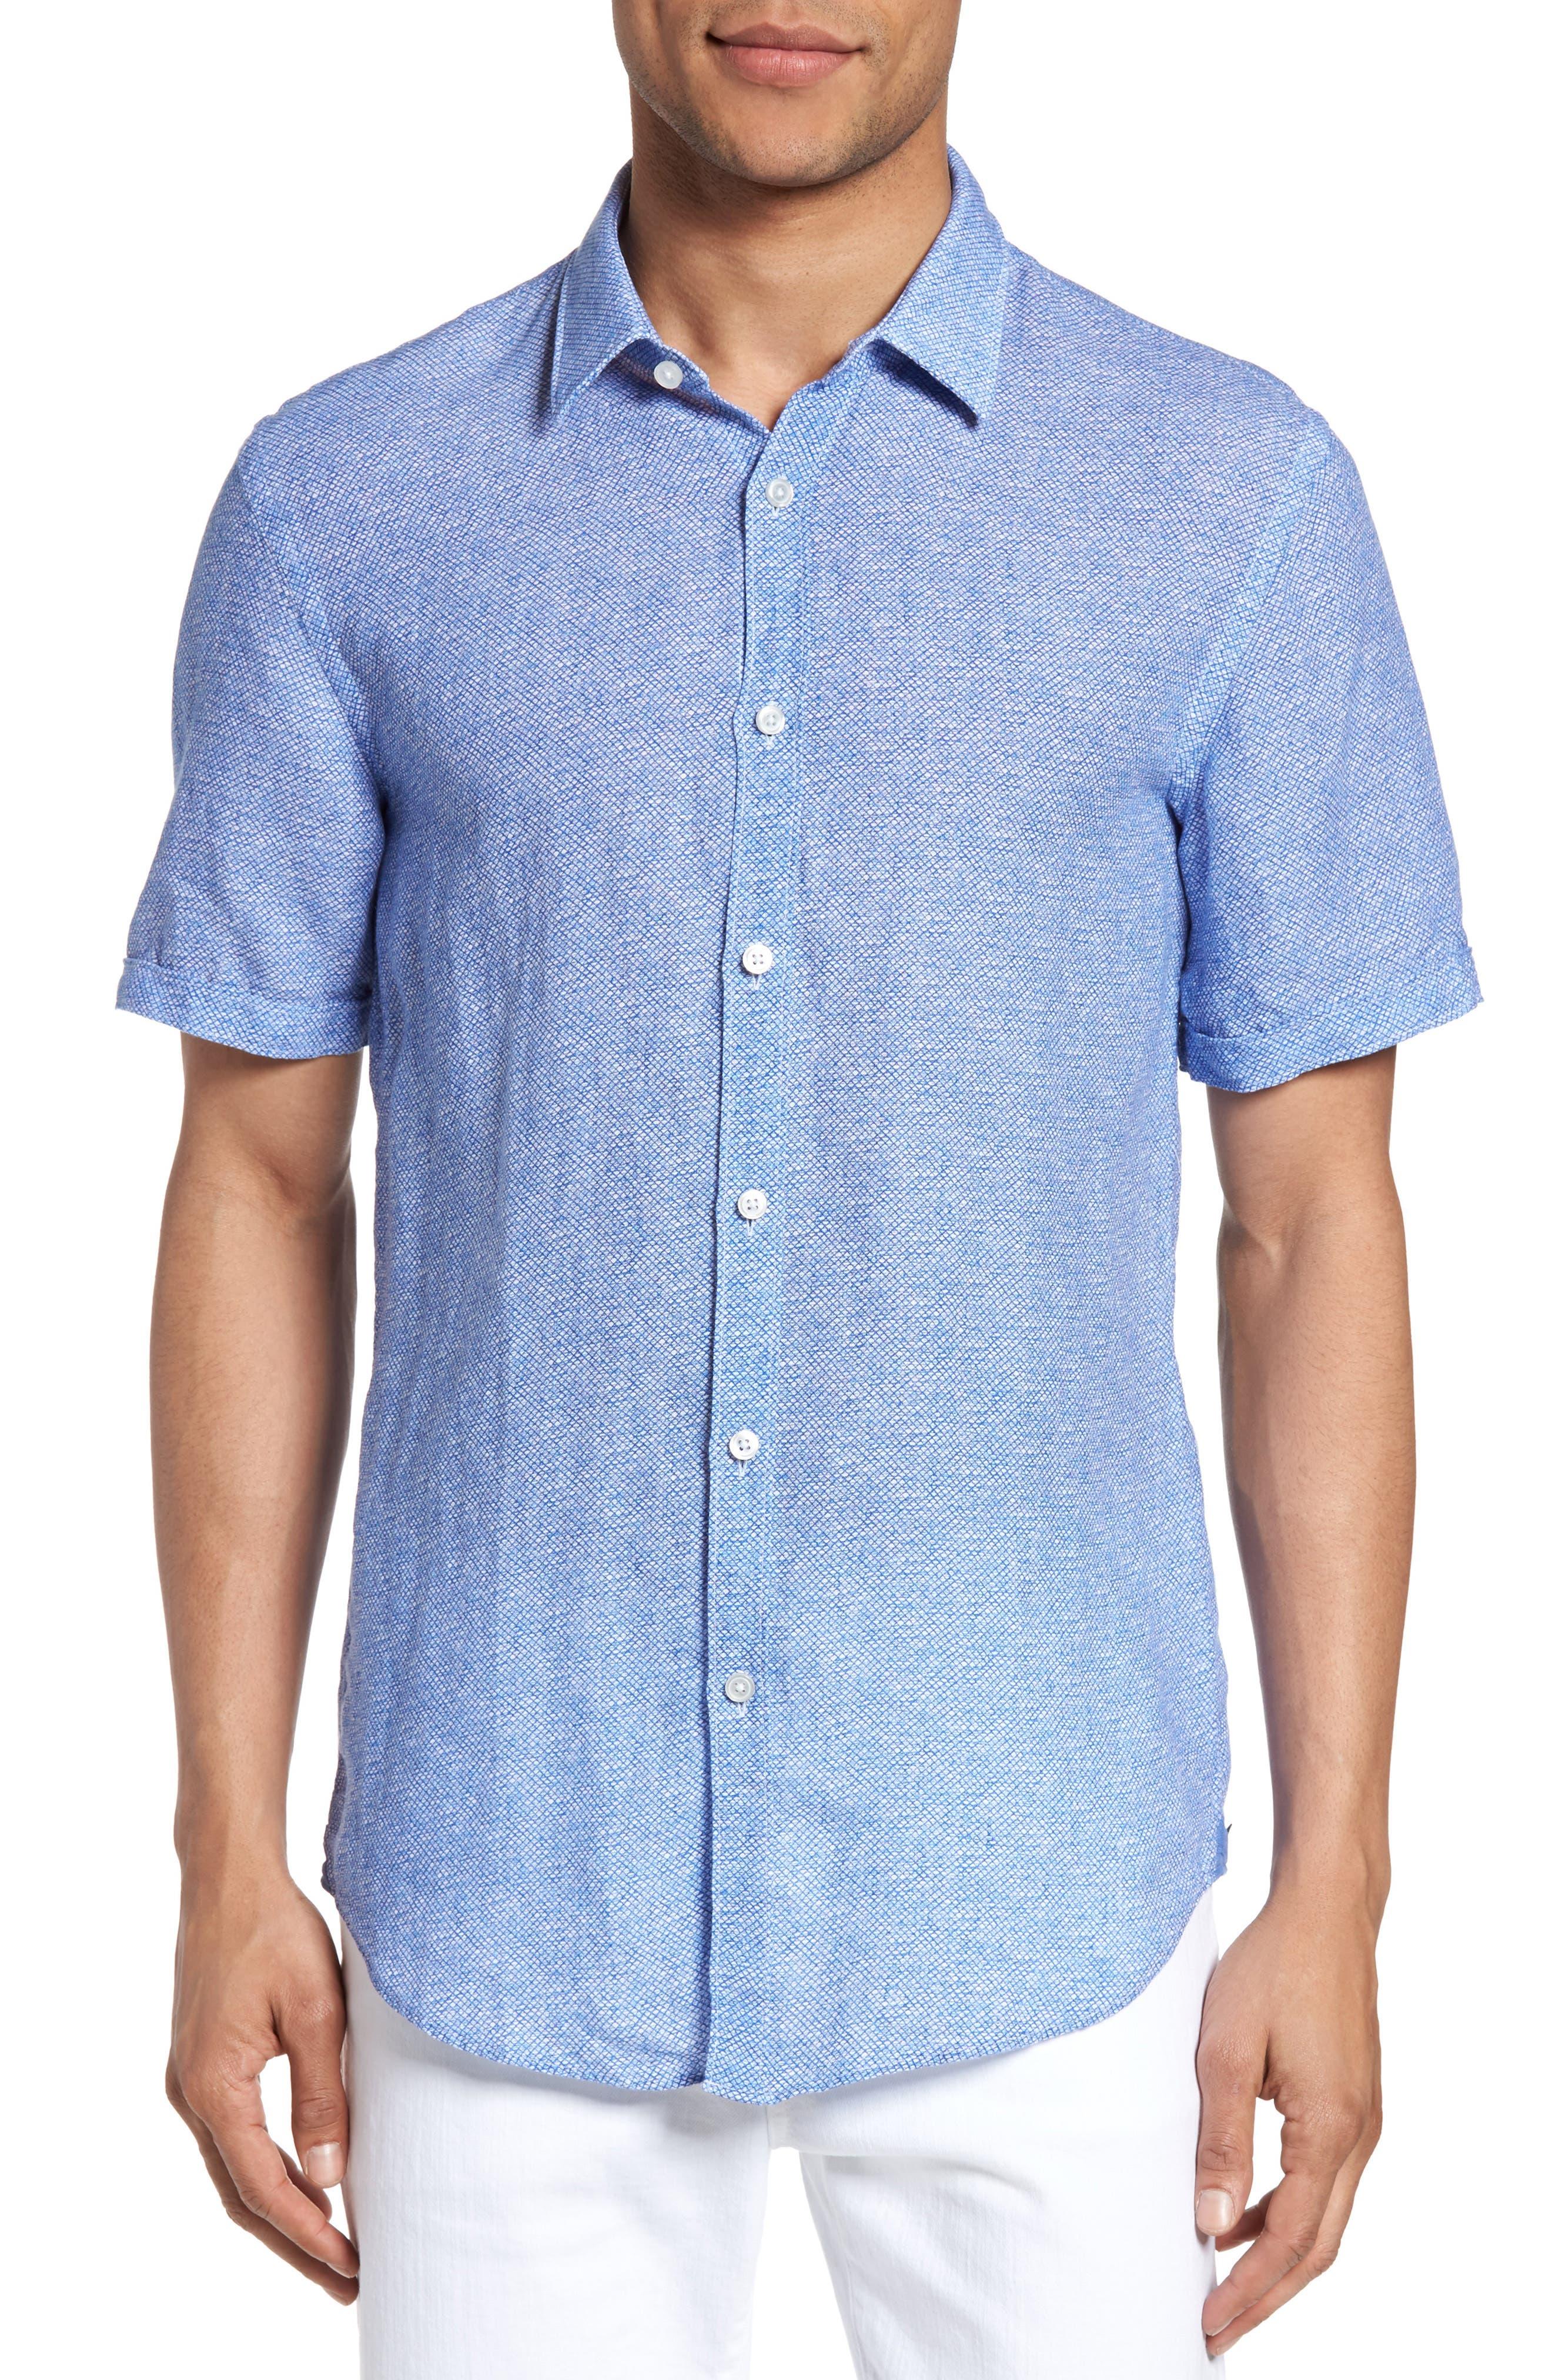 Ronn Extra Slim Fit Print Linen Sport Shirt,                             Main thumbnail 1, color,                             421